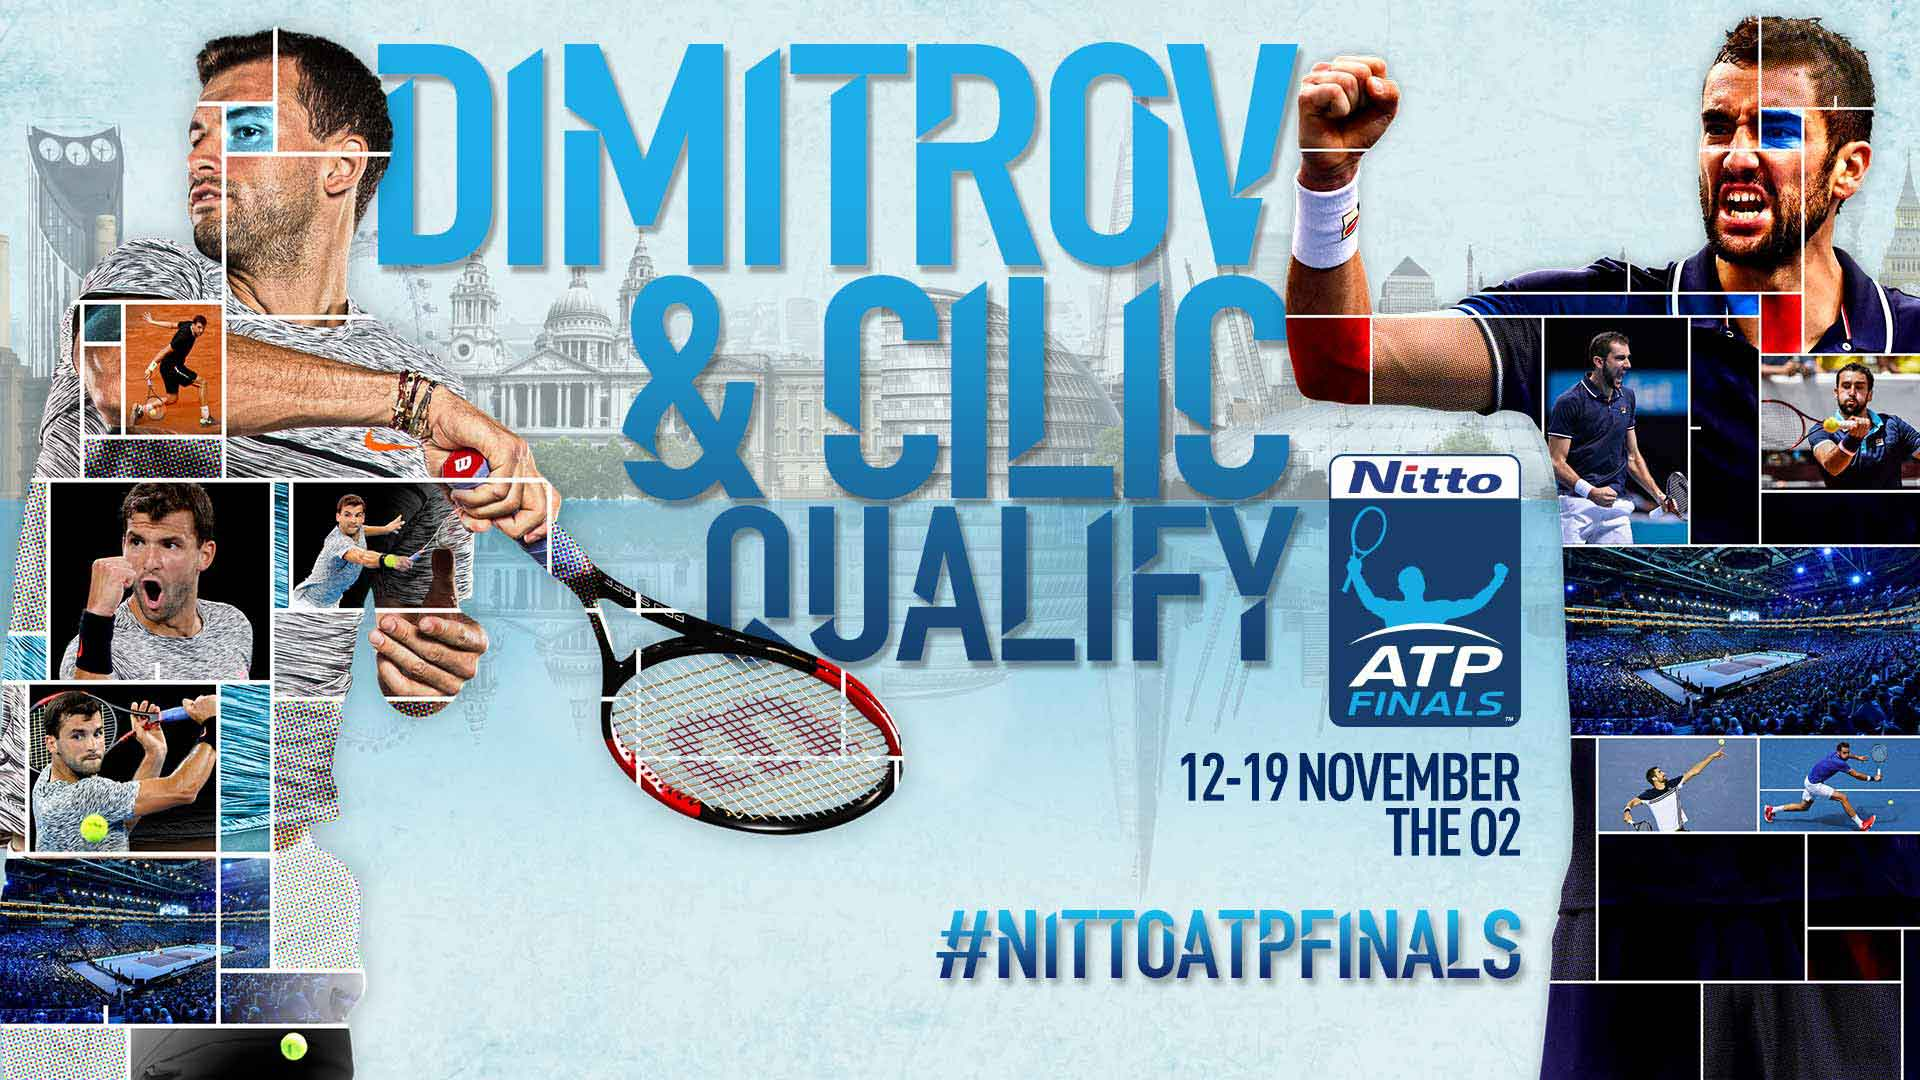 Dimitrov Cilic Qualify For Nitto Atp Finals Atp Tour Tennis